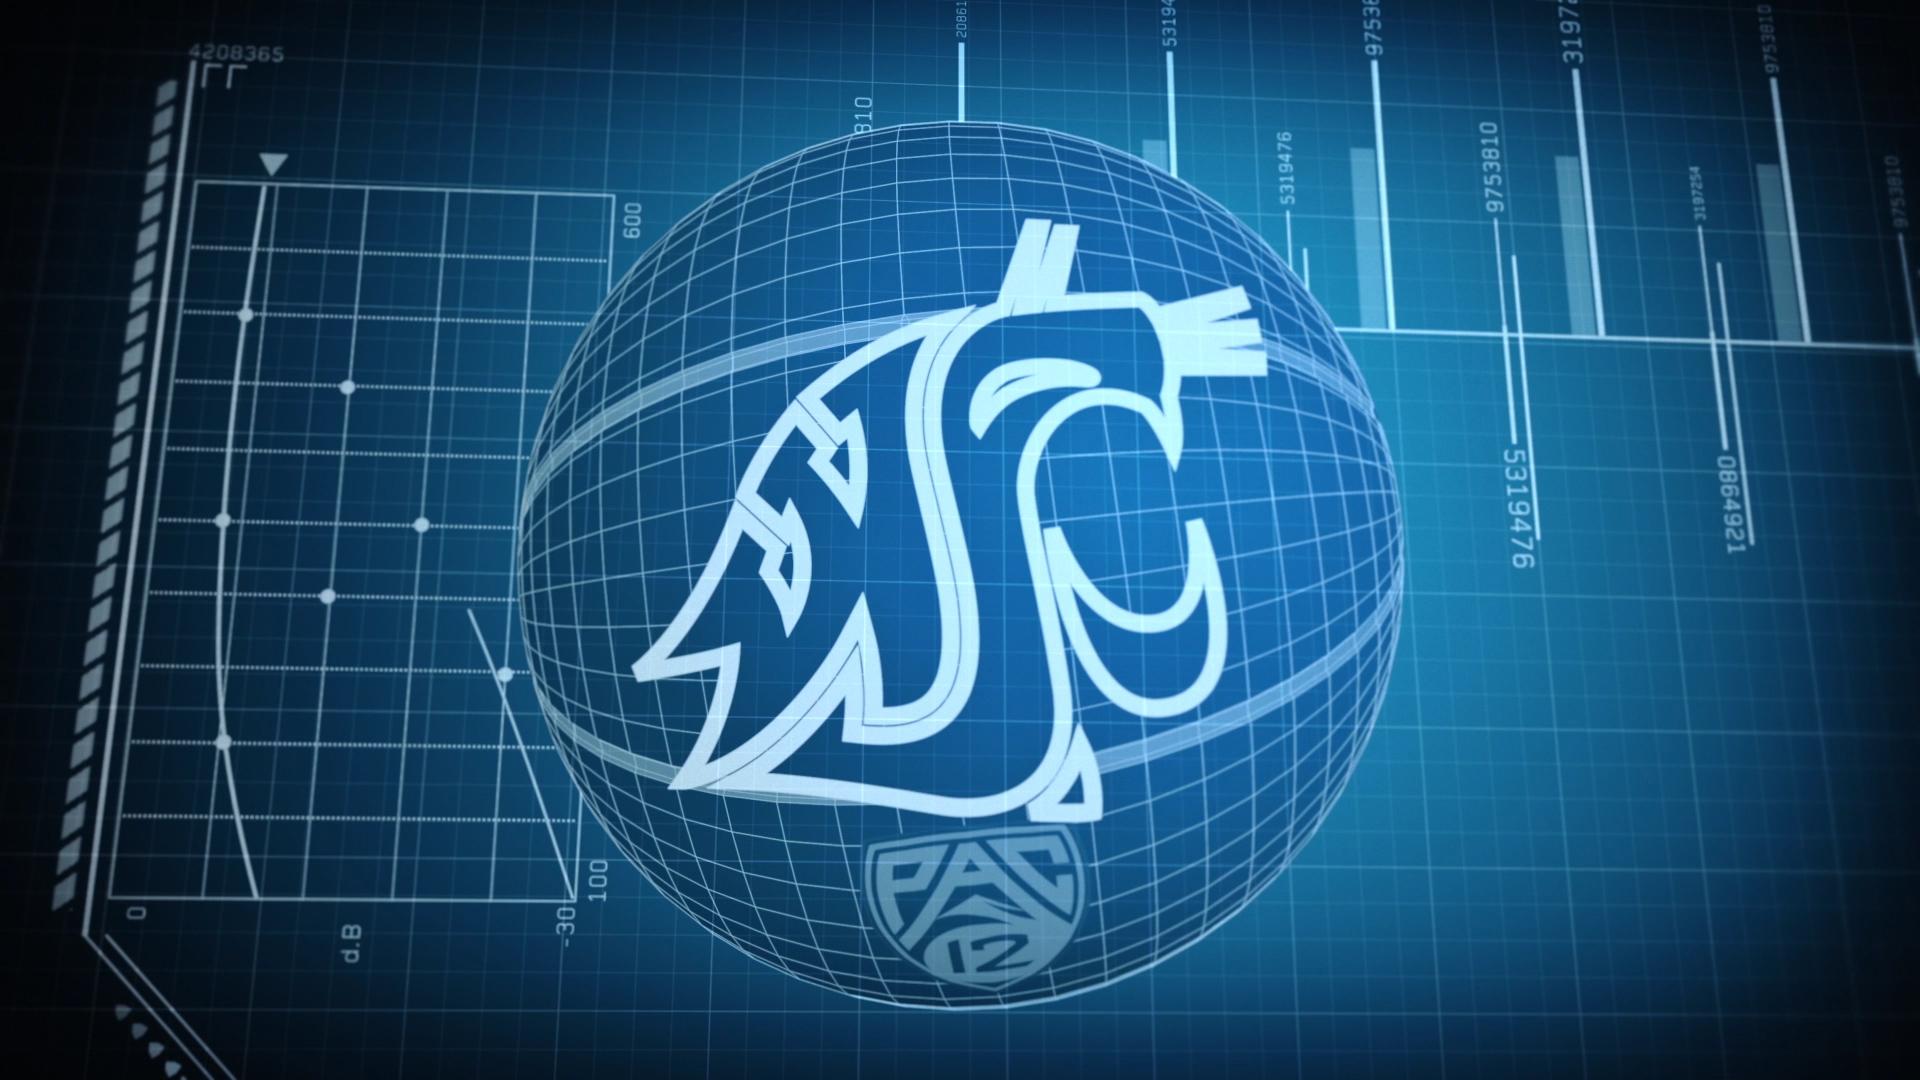 2013 Washington State Cougars football sizzle Pac 1920x1080